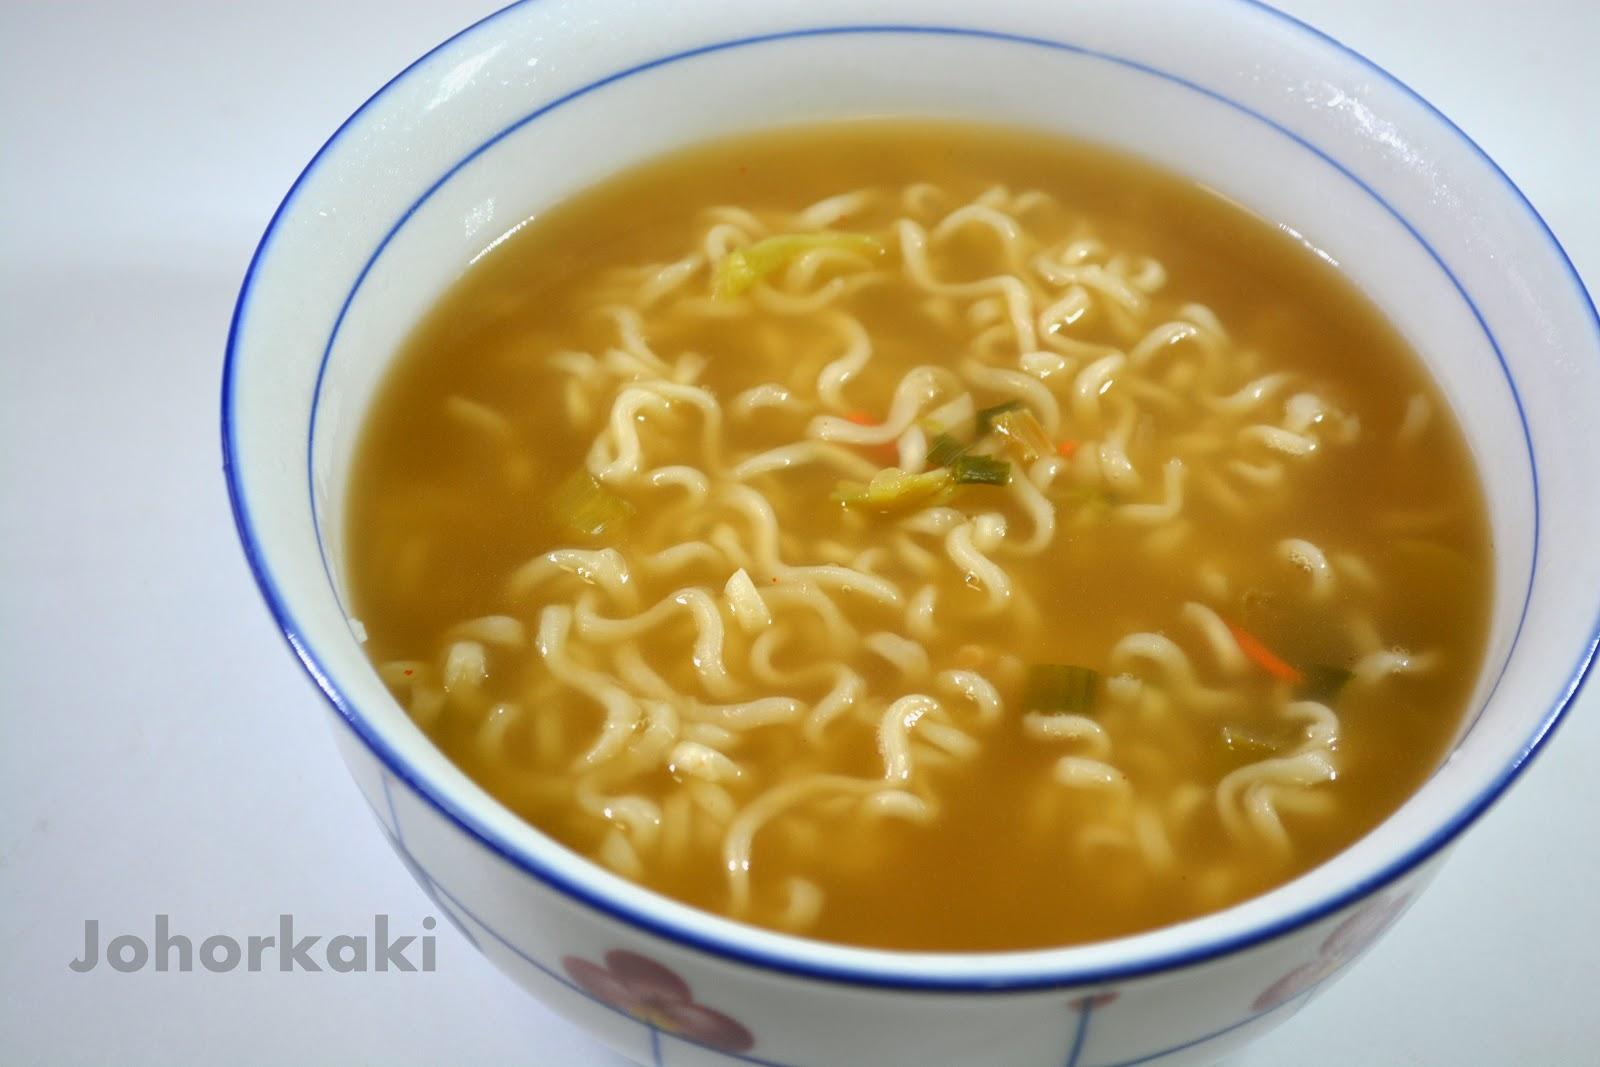 Samyang Japanese Style Flavour U-dong Instant Noodle Soup |joHoR kAki ...